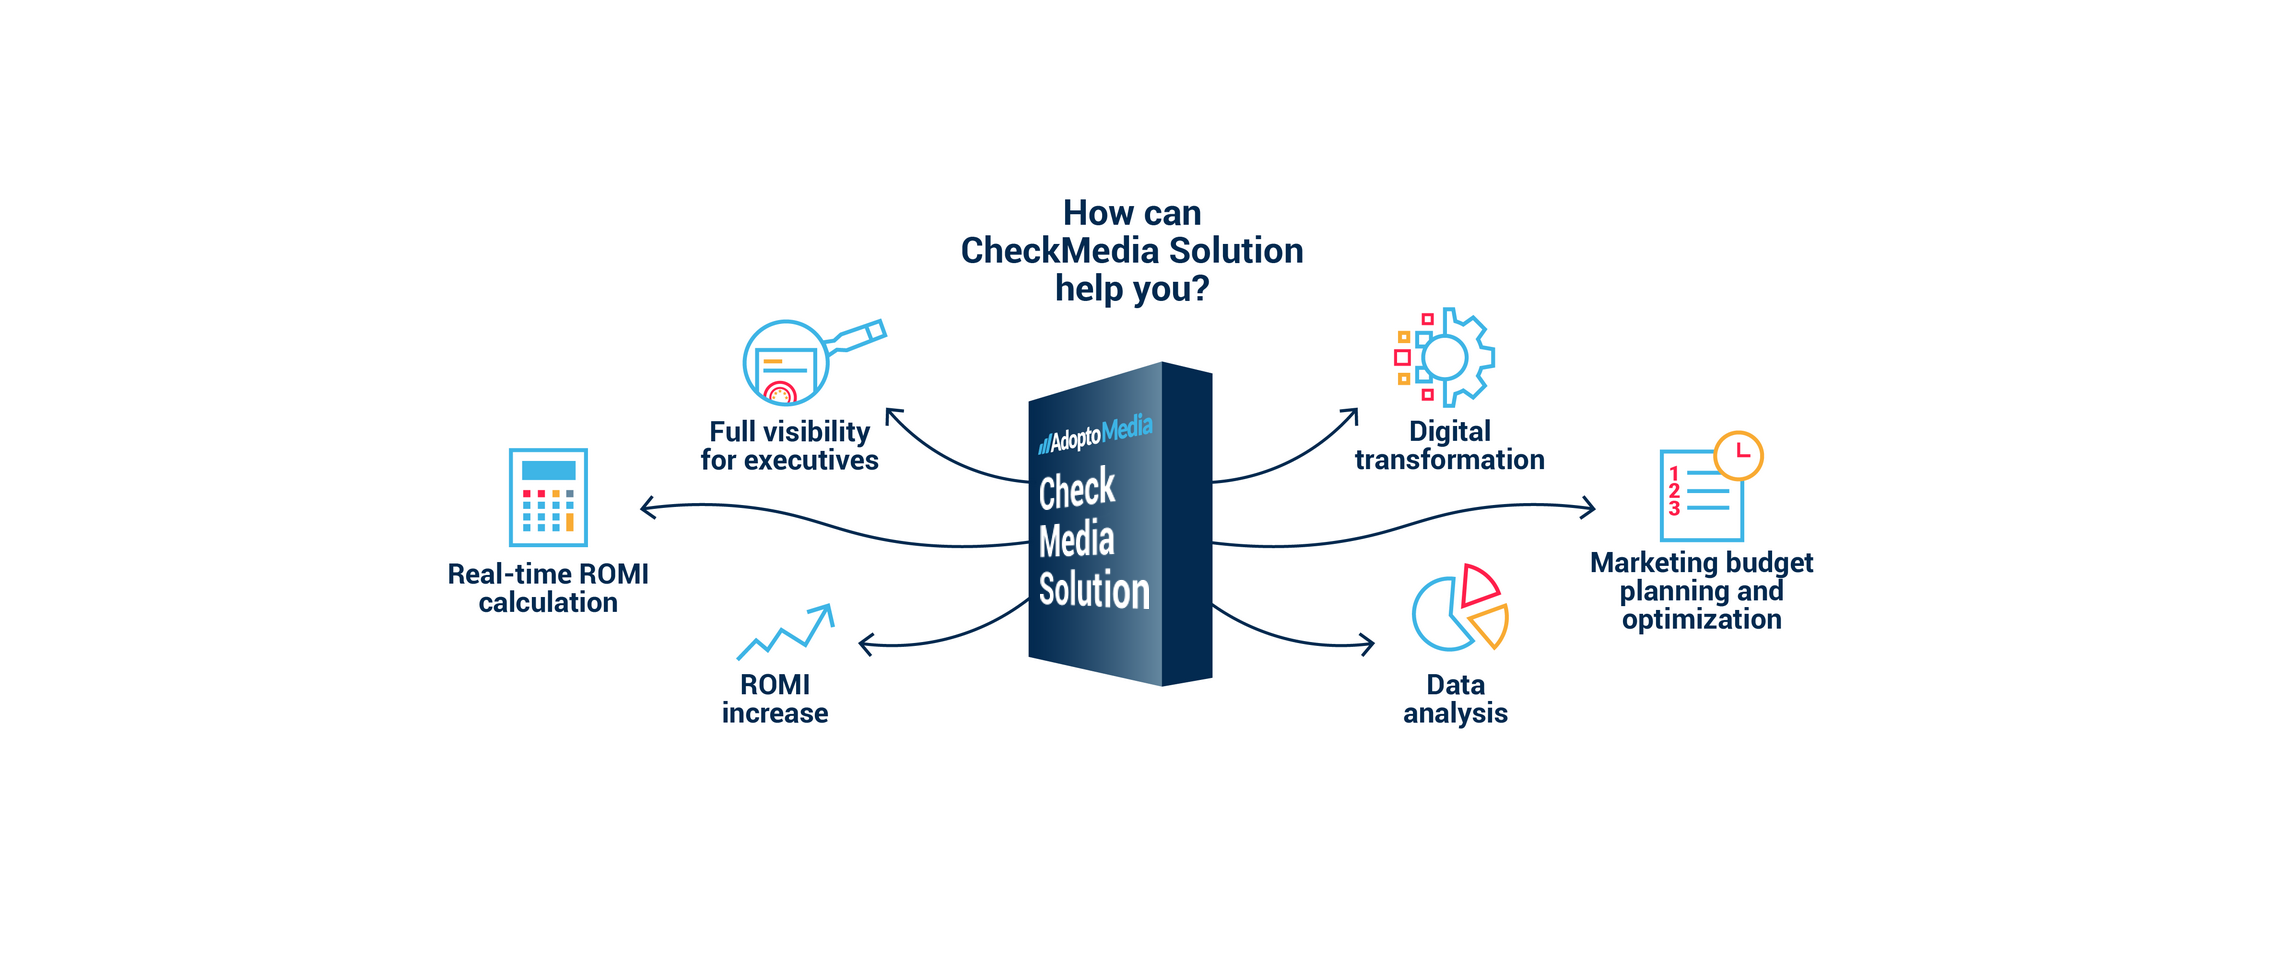 Adoptomedia, Checkmedia solution, ad optimisation, ad automation, marketing budget optimisation, digital transformation, visibility, transparency, compliance